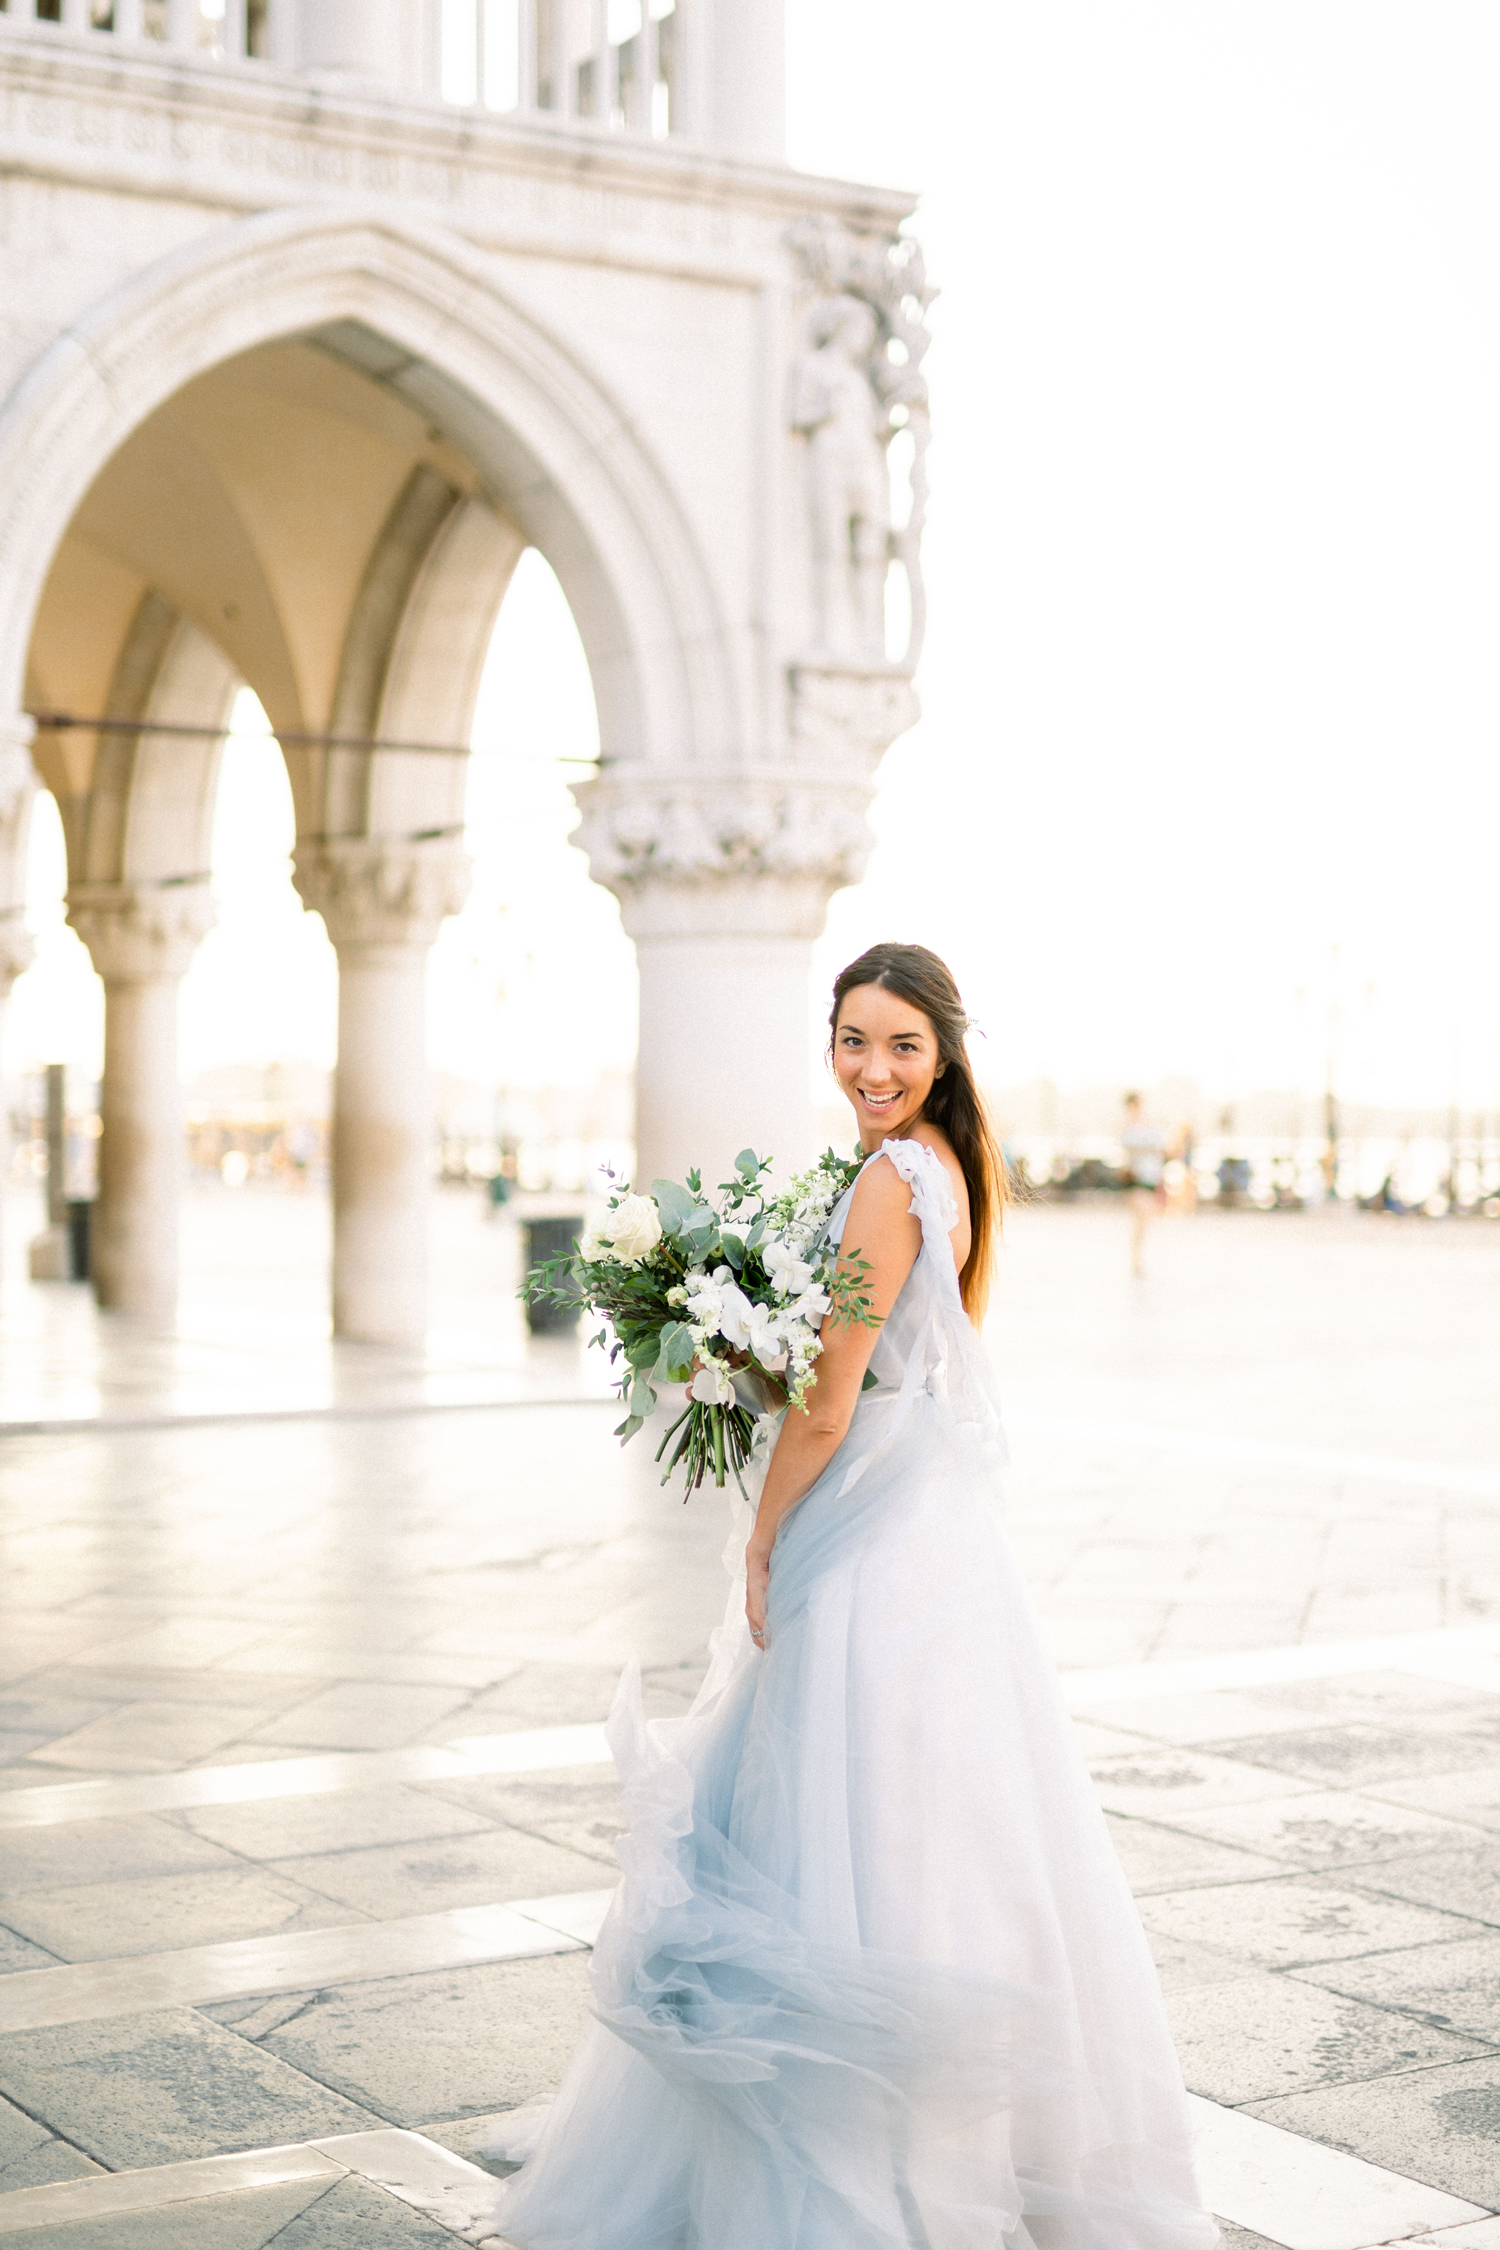 bride wearing light blue wedding dress